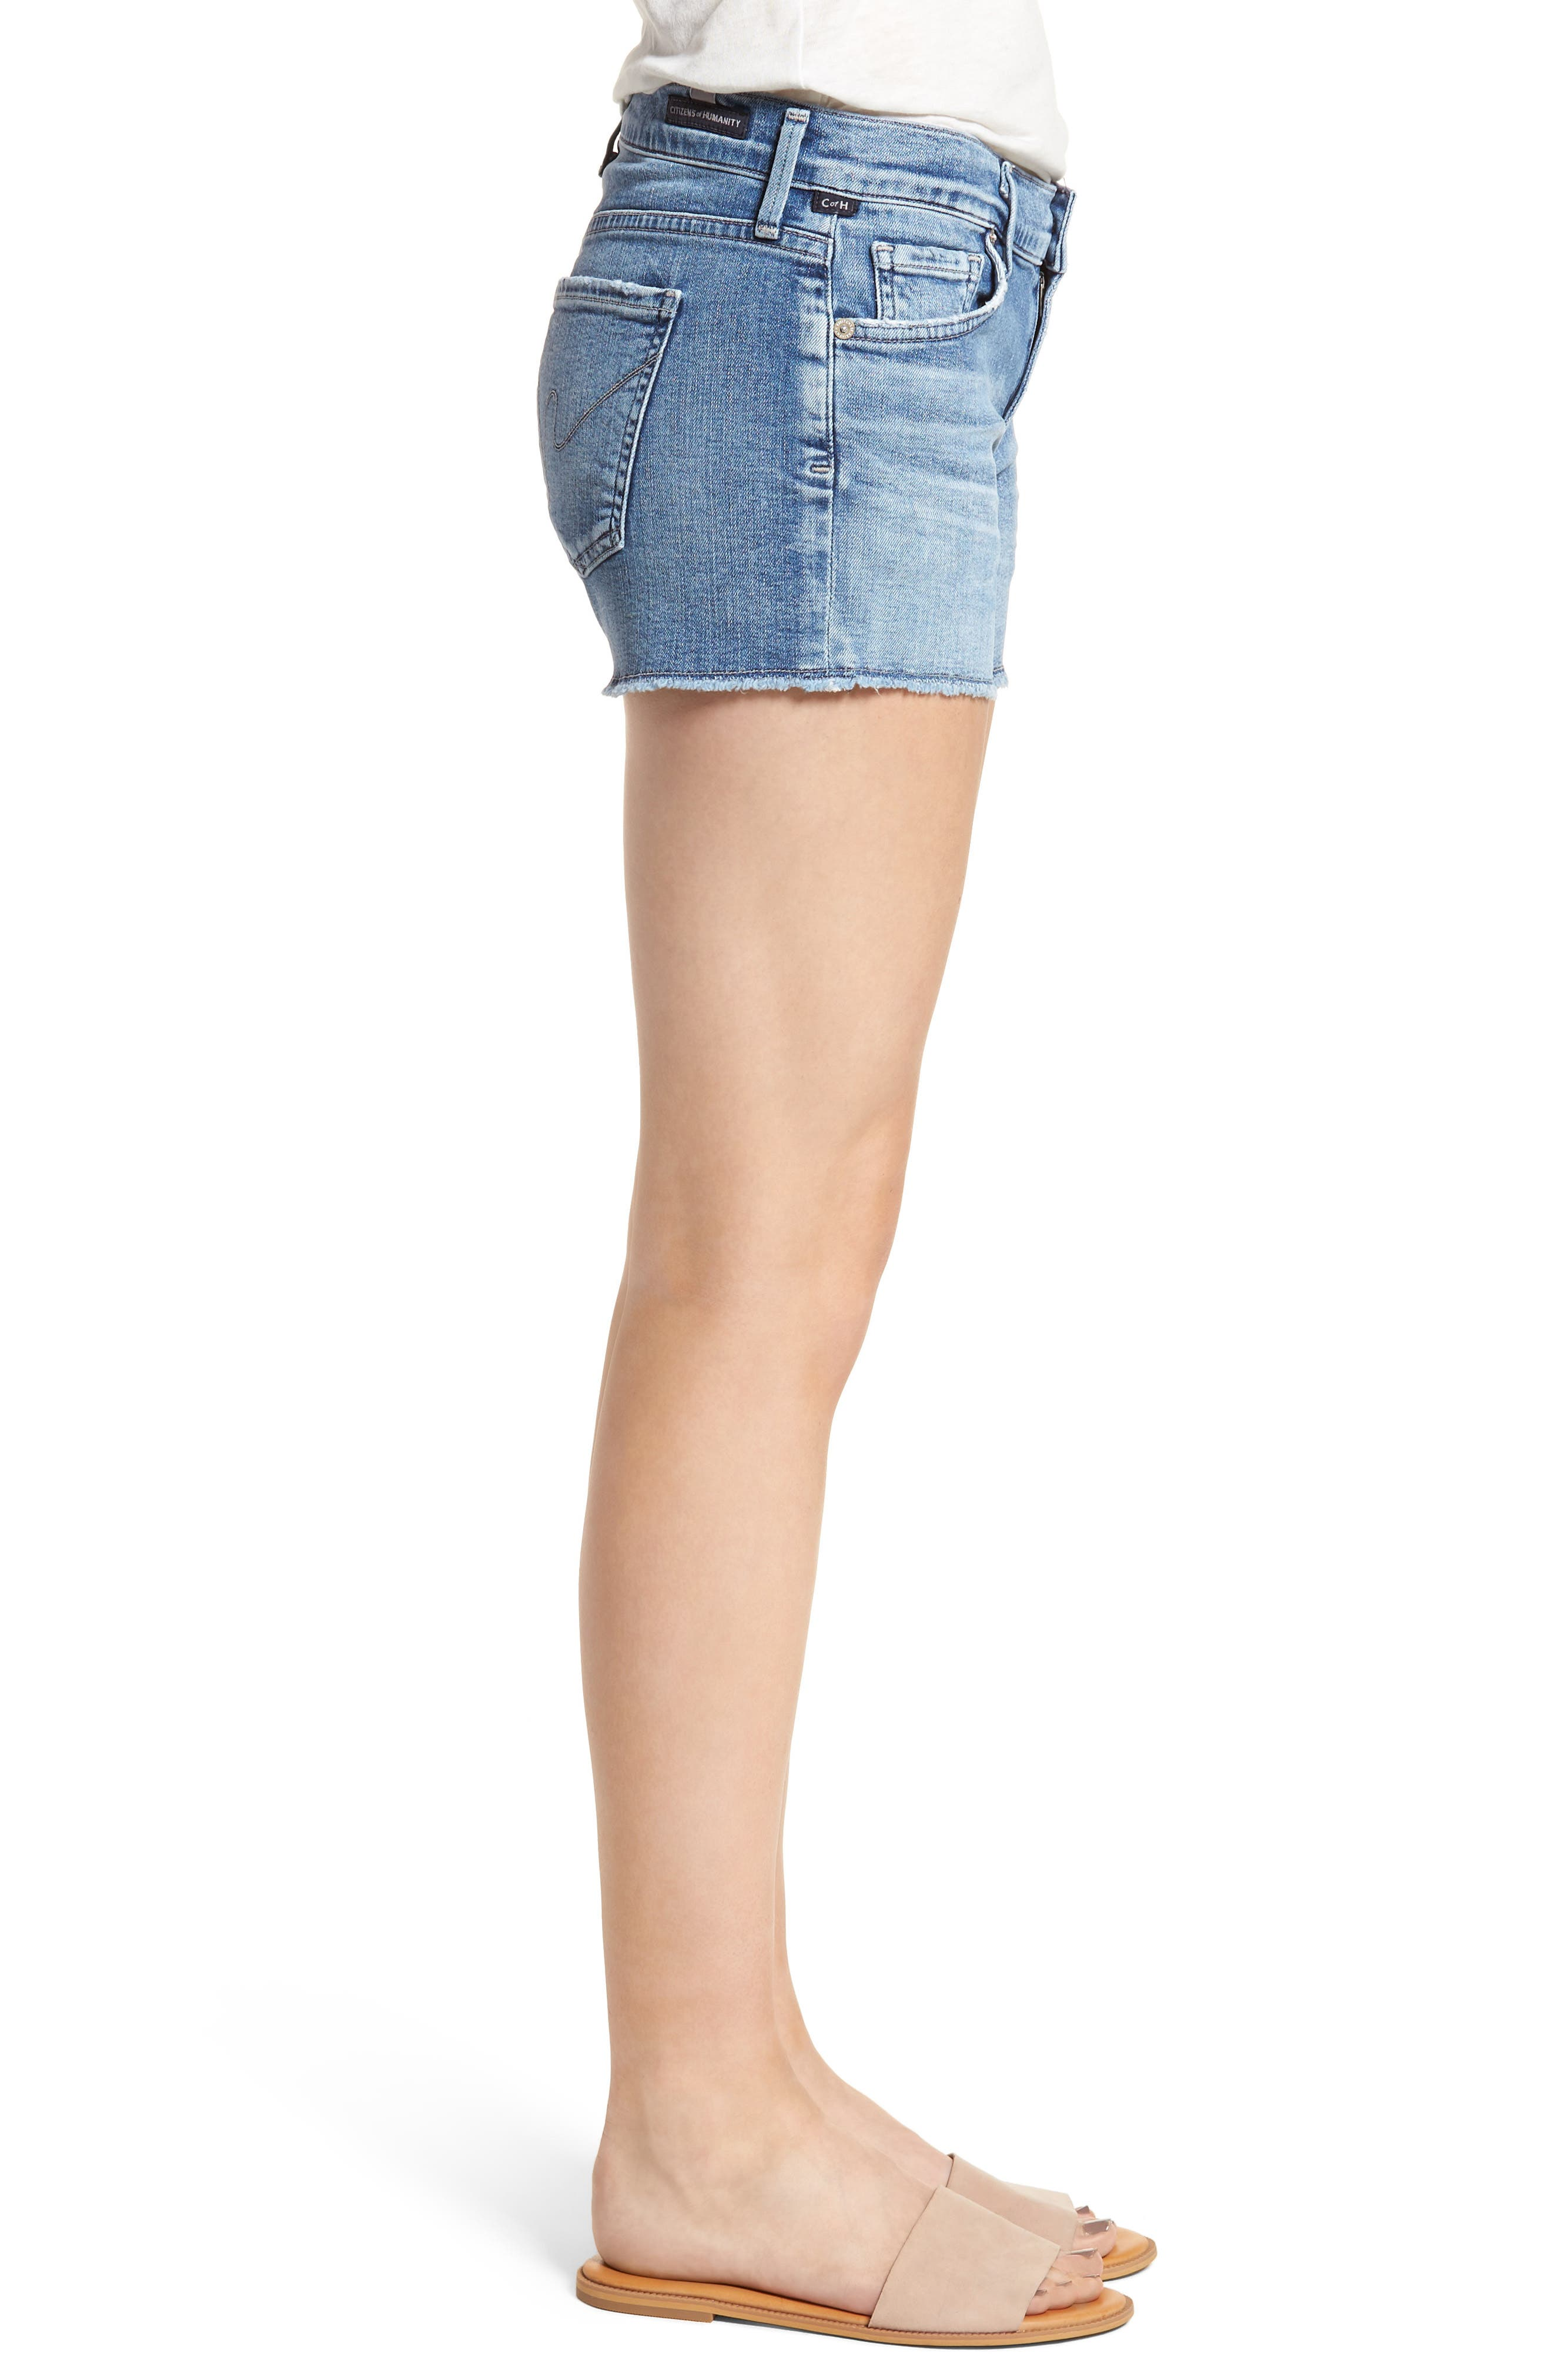 Alternate Image 3  - Citizens of Humanity Ava Cutoff Denim Shorts (Pacifica)